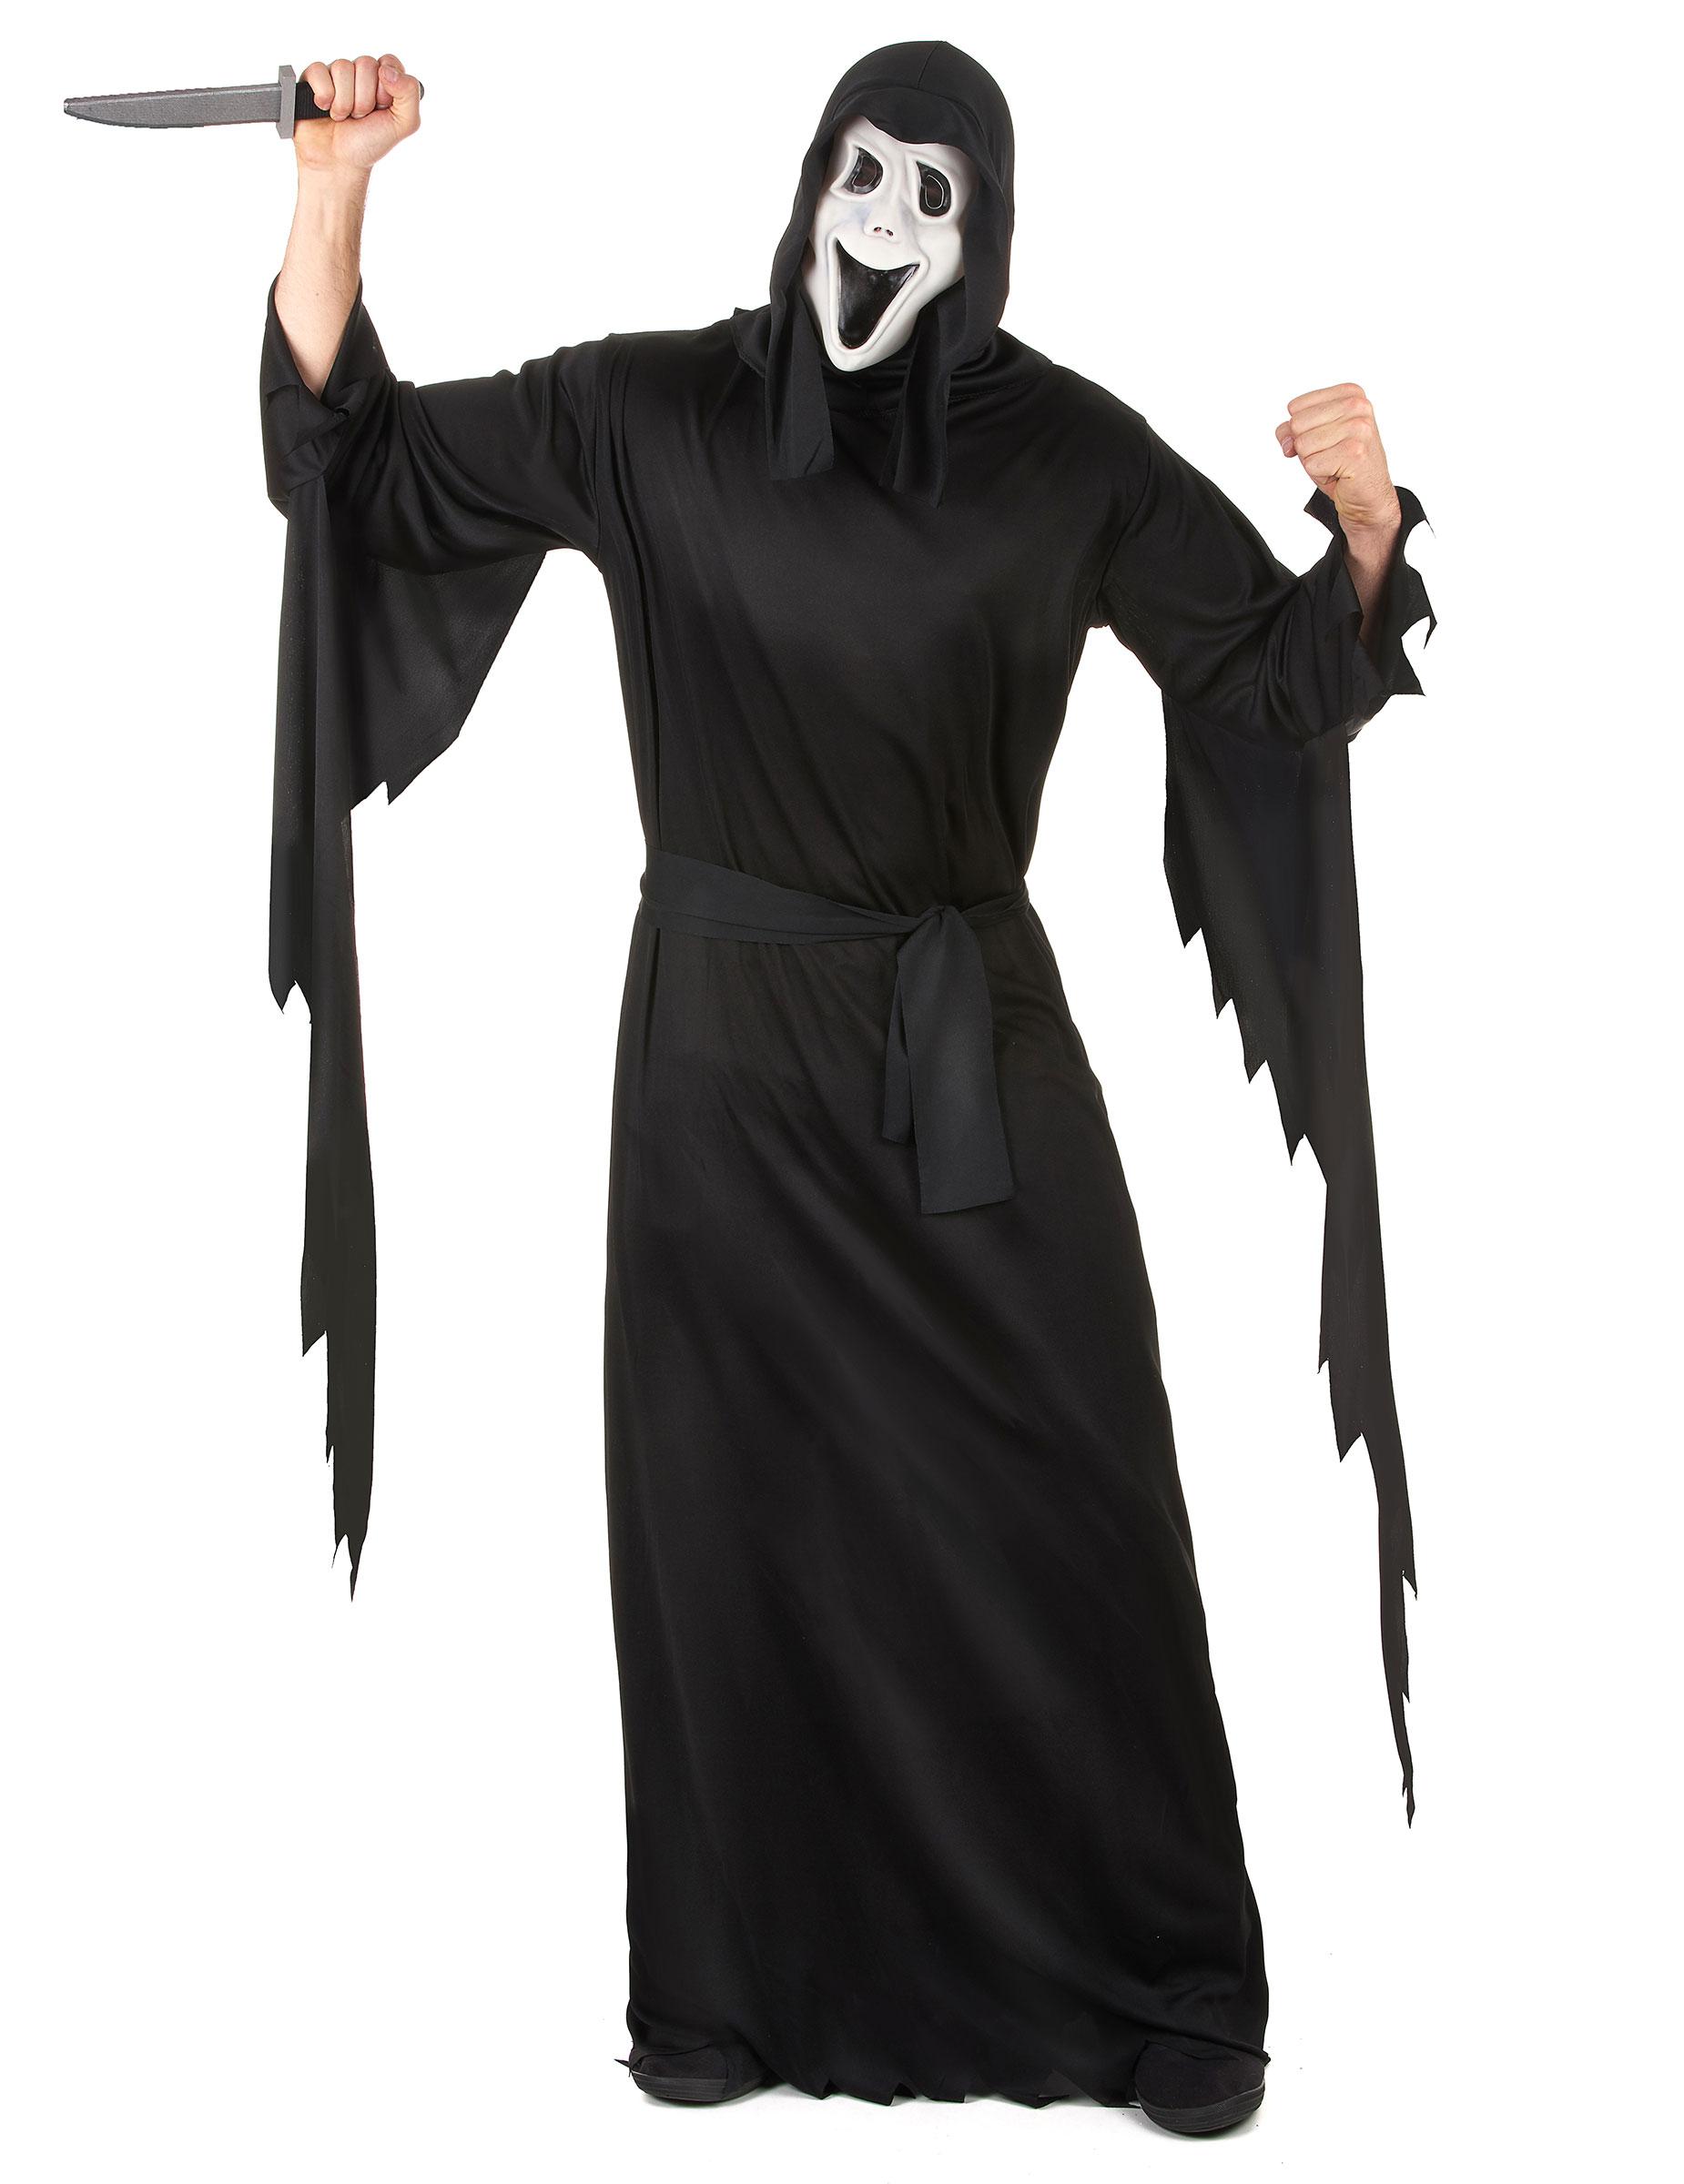 30 Ideas de Disfraces de Halloween para Hombres